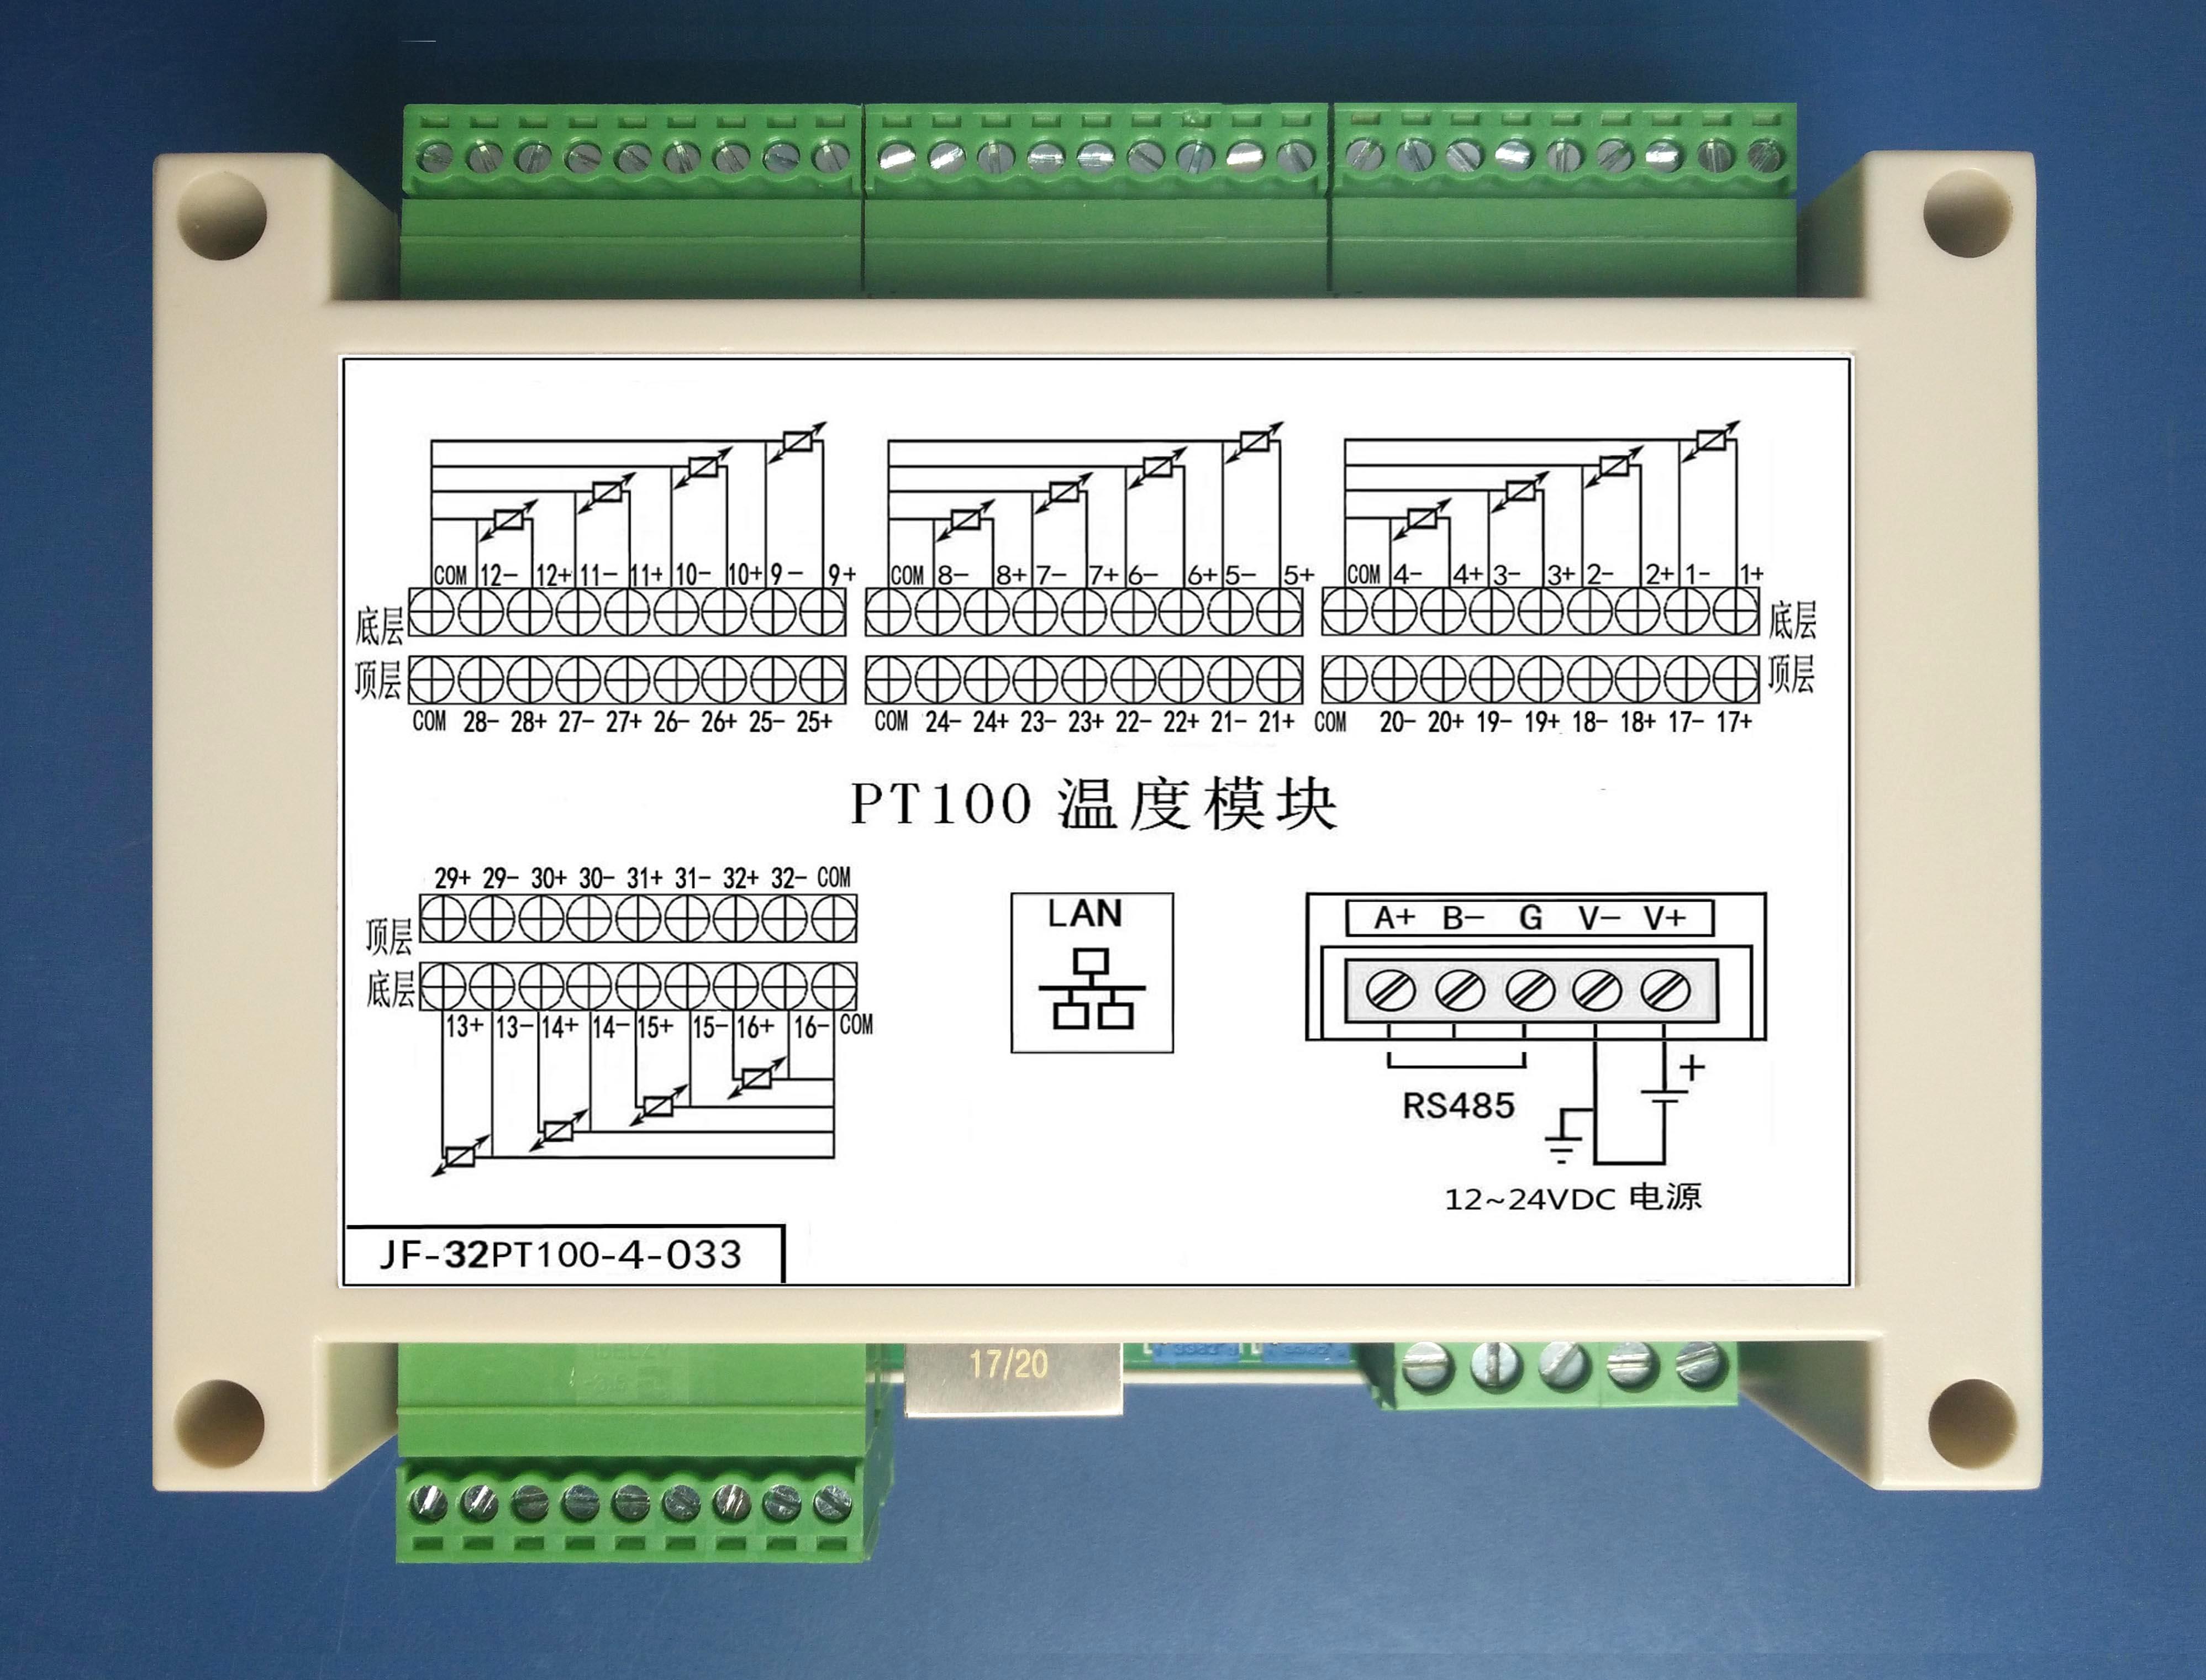 32 Road Pt100 Temperature Acquisition Module Three Line Modbus-RTU/ Network Port /485 Ethernet Configuration